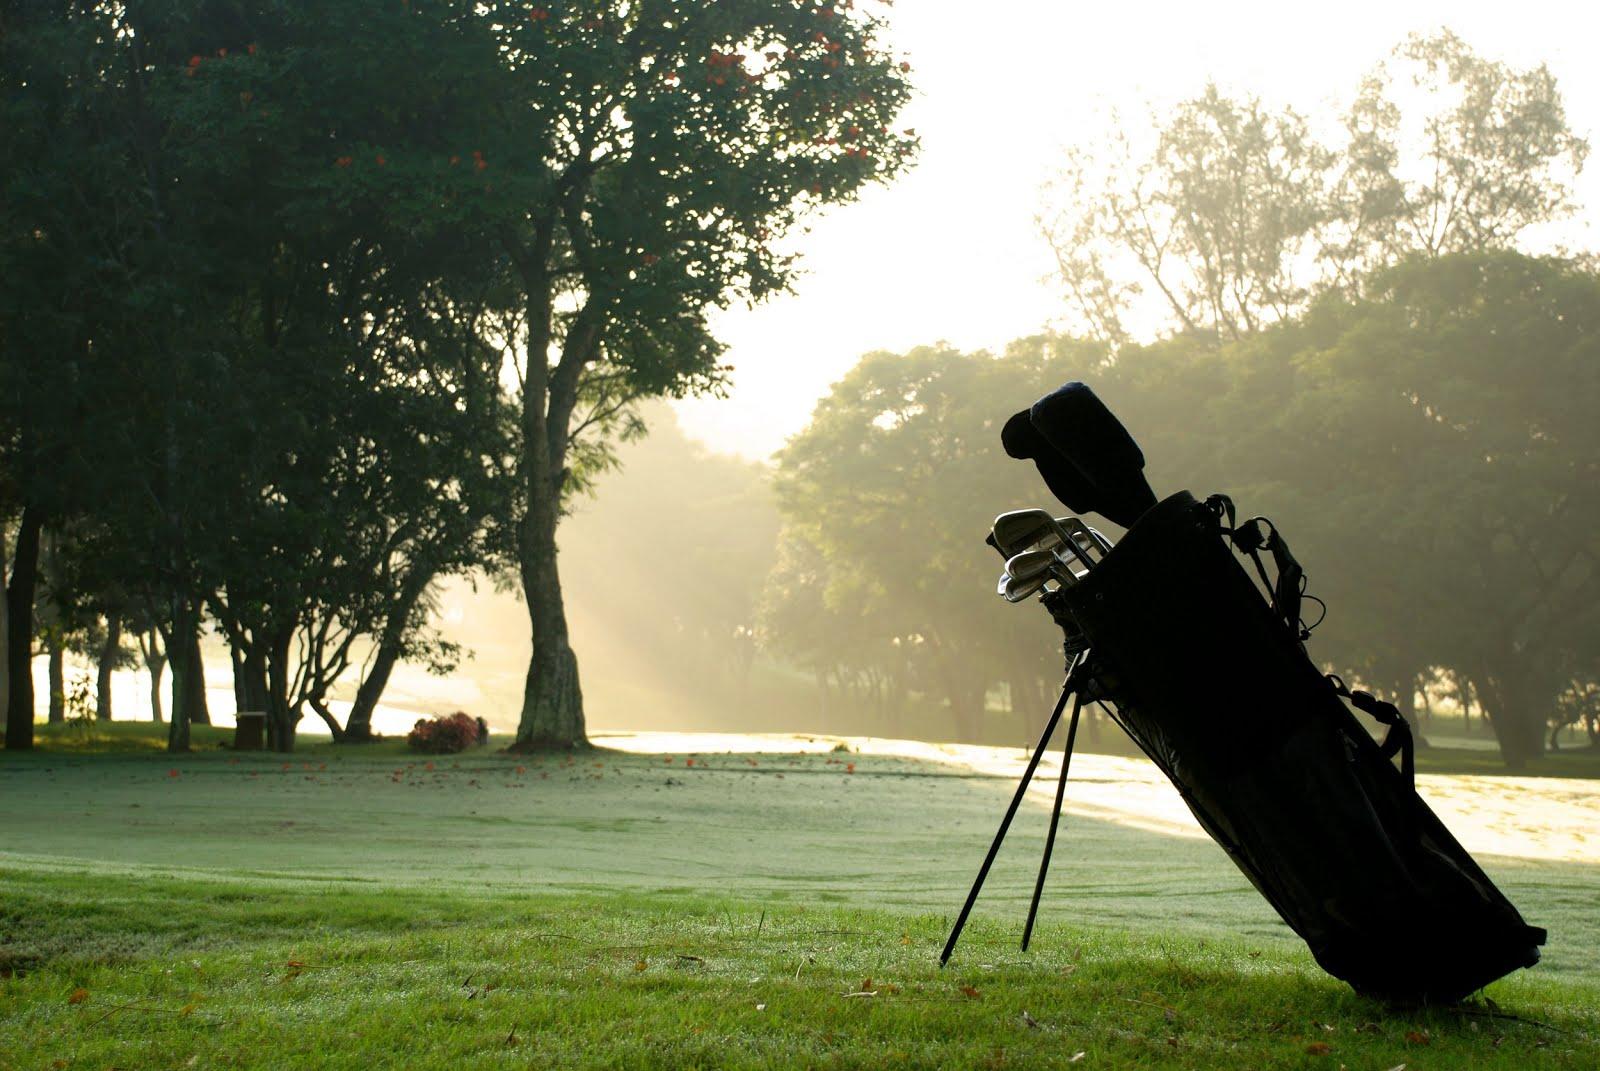 Resort Golf Course